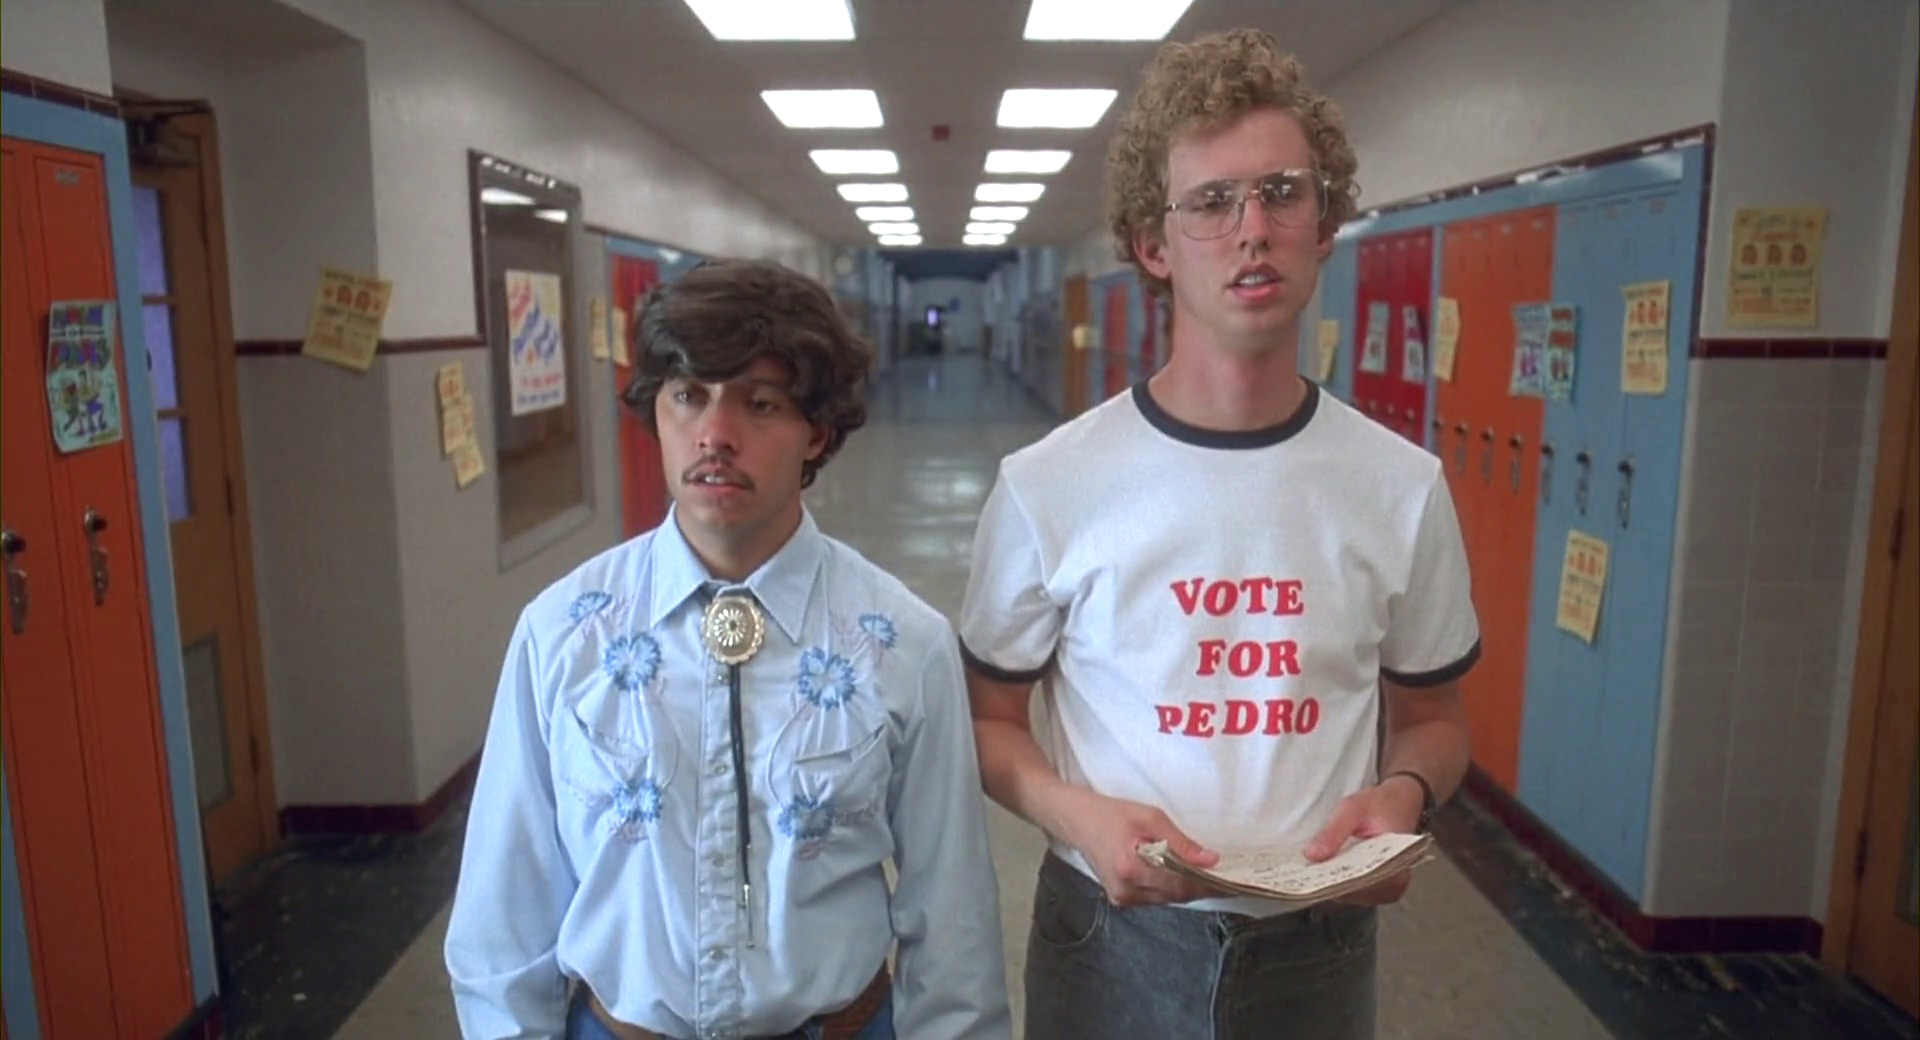 film-napoleon_dynamite-2004-napoleon_dynamite-jonheder-tshirts-vote_for_pedro_tshirt